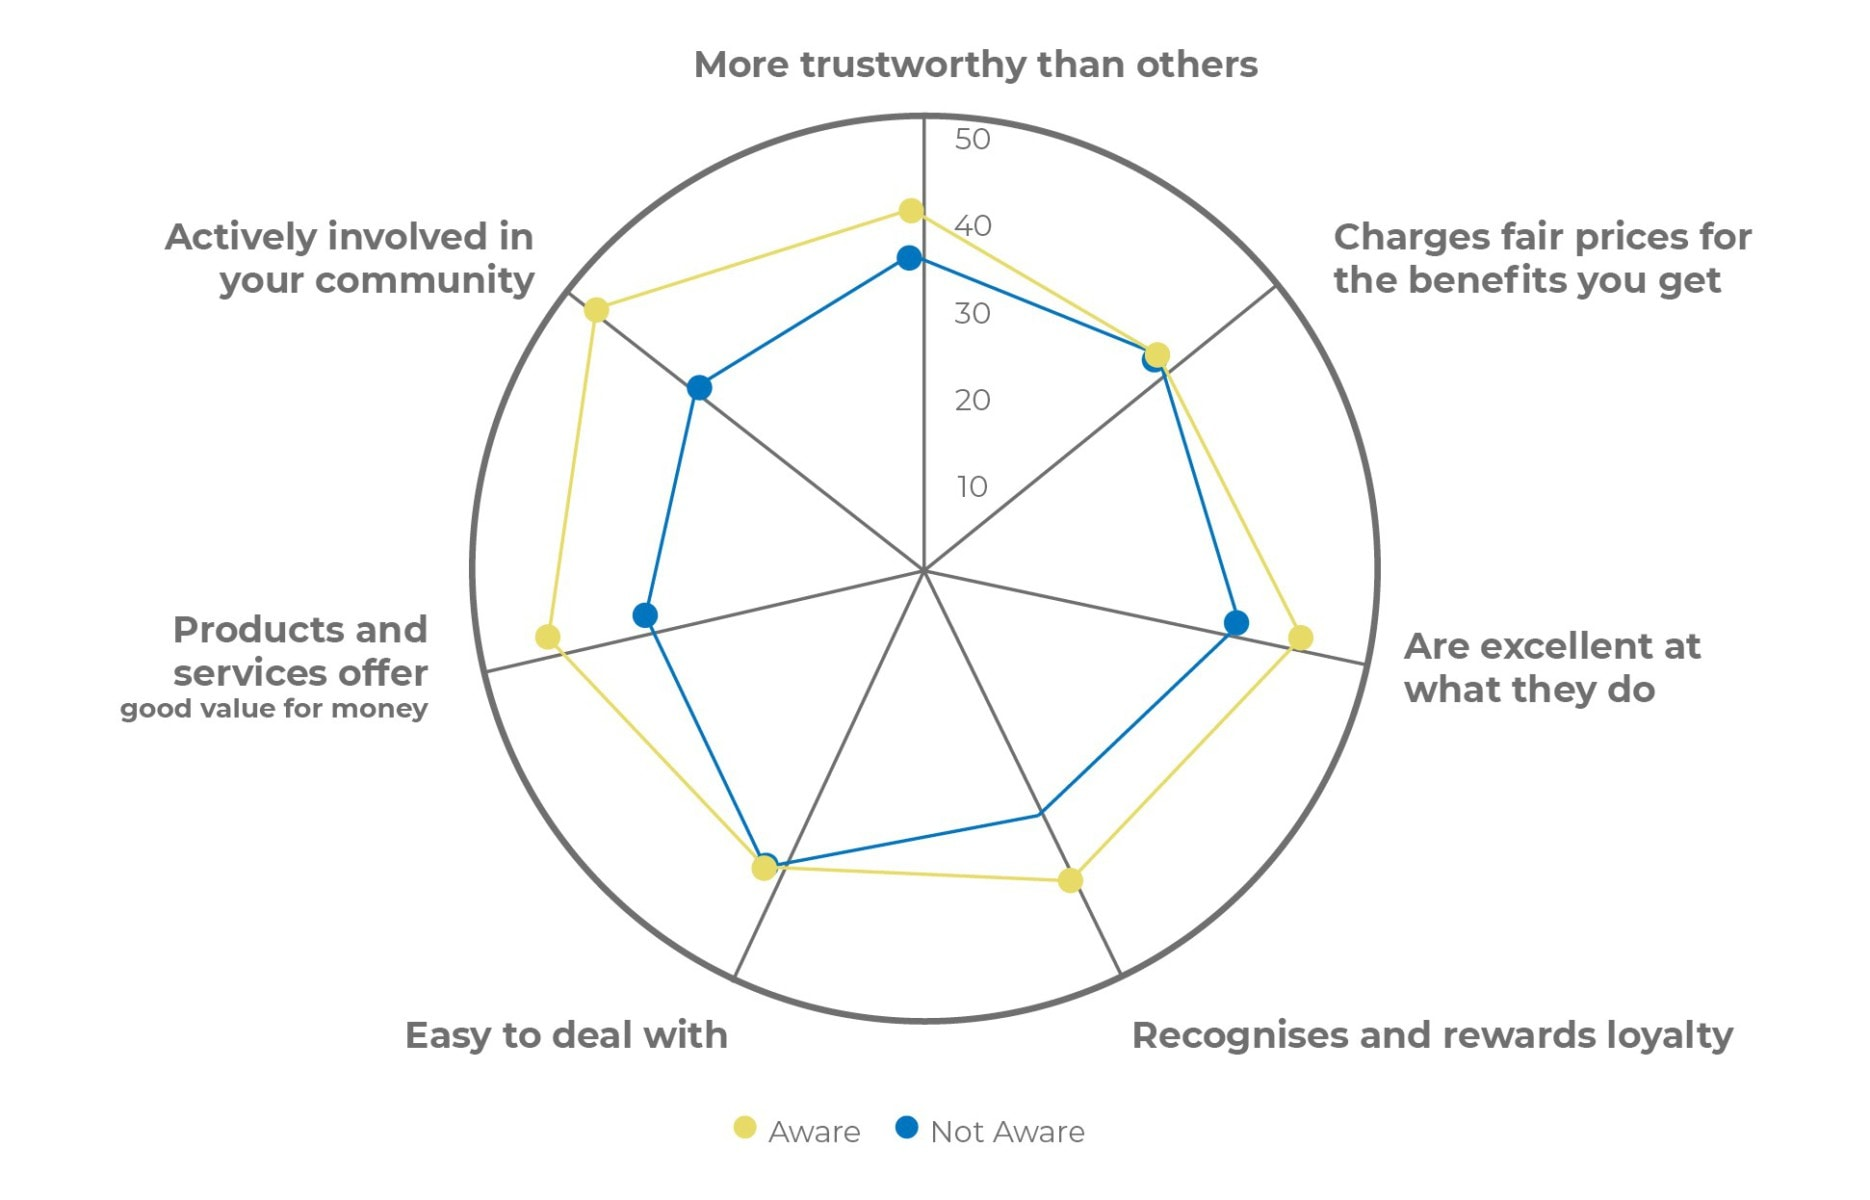 Sponsorship Impact: Brand Image Perceptions